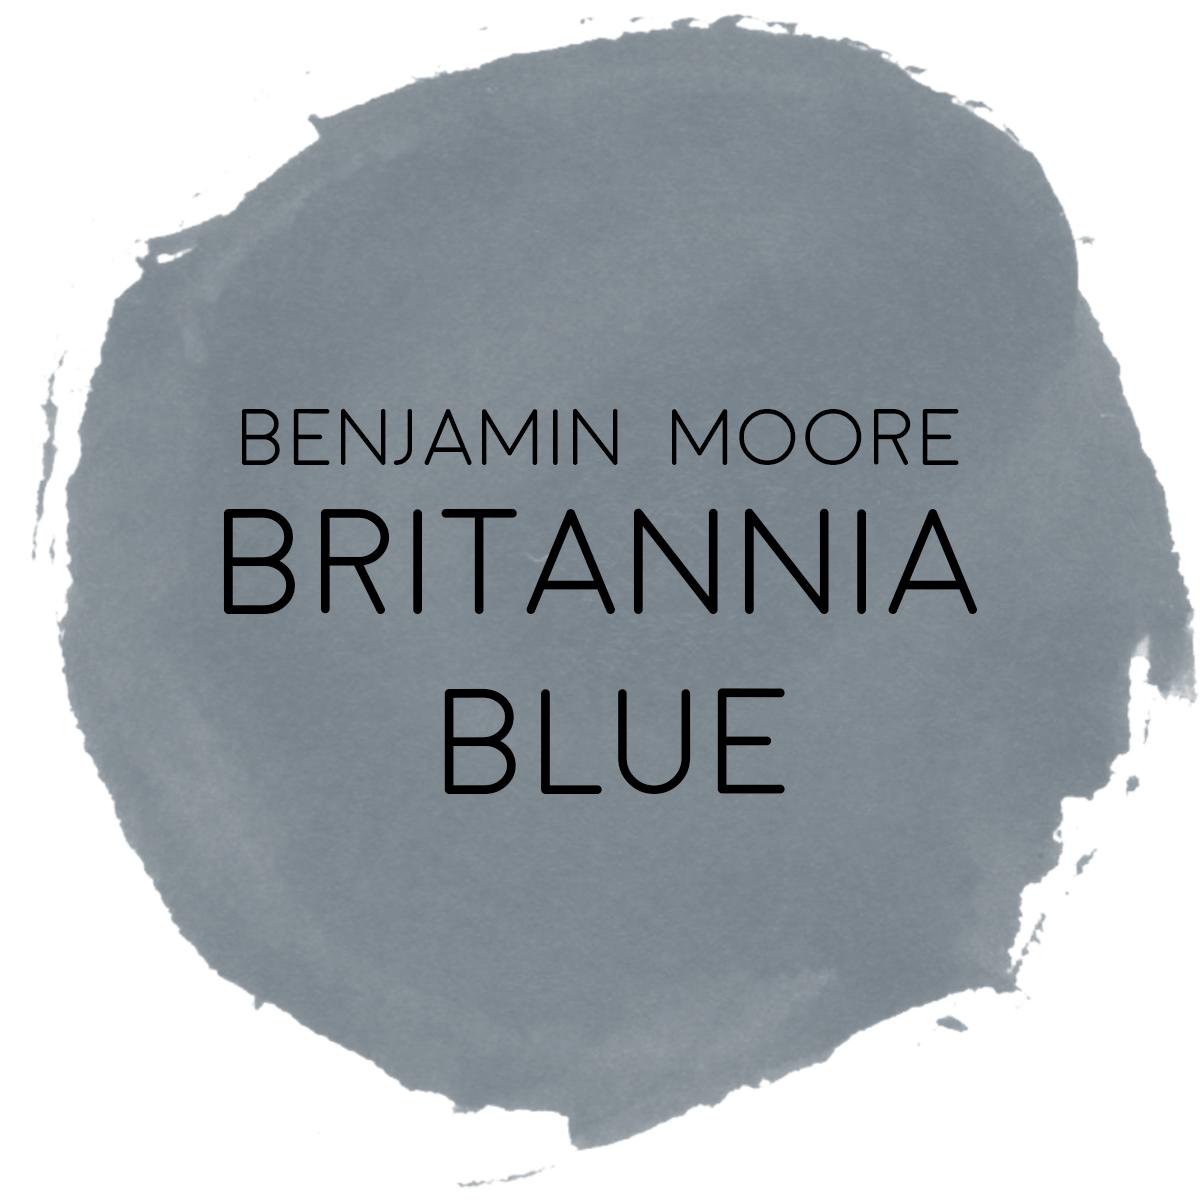 blackband_design_bm_britannia_blue